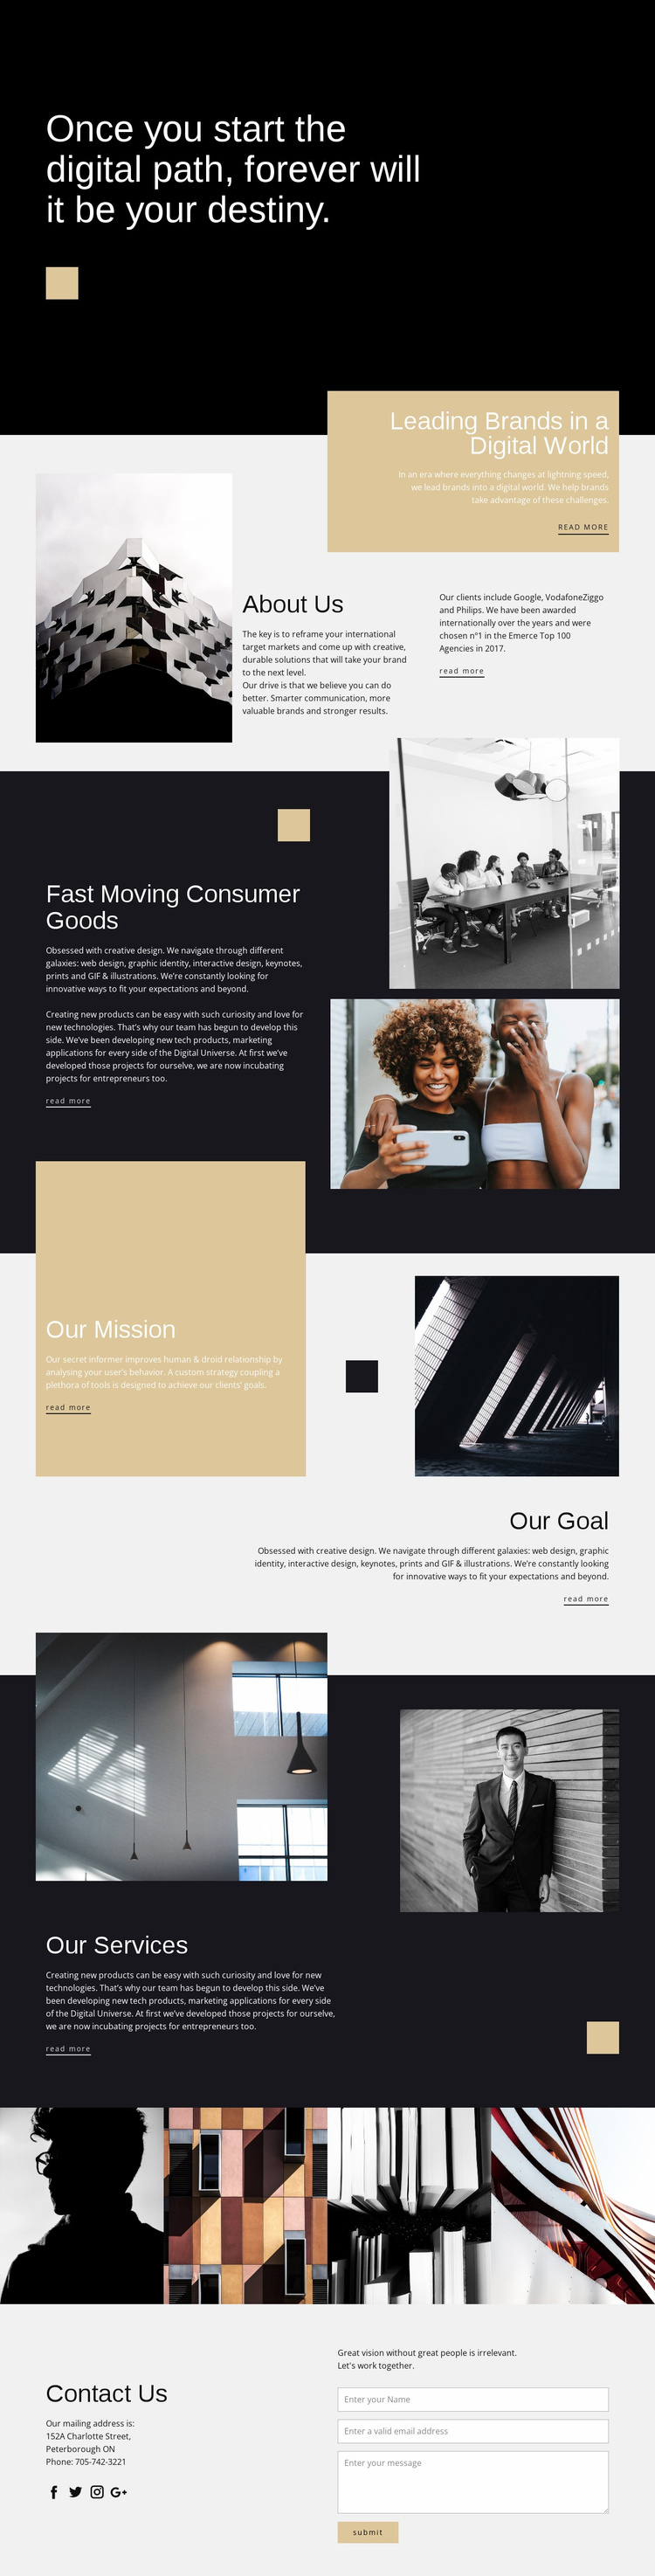 Destiny photo studio Website Template